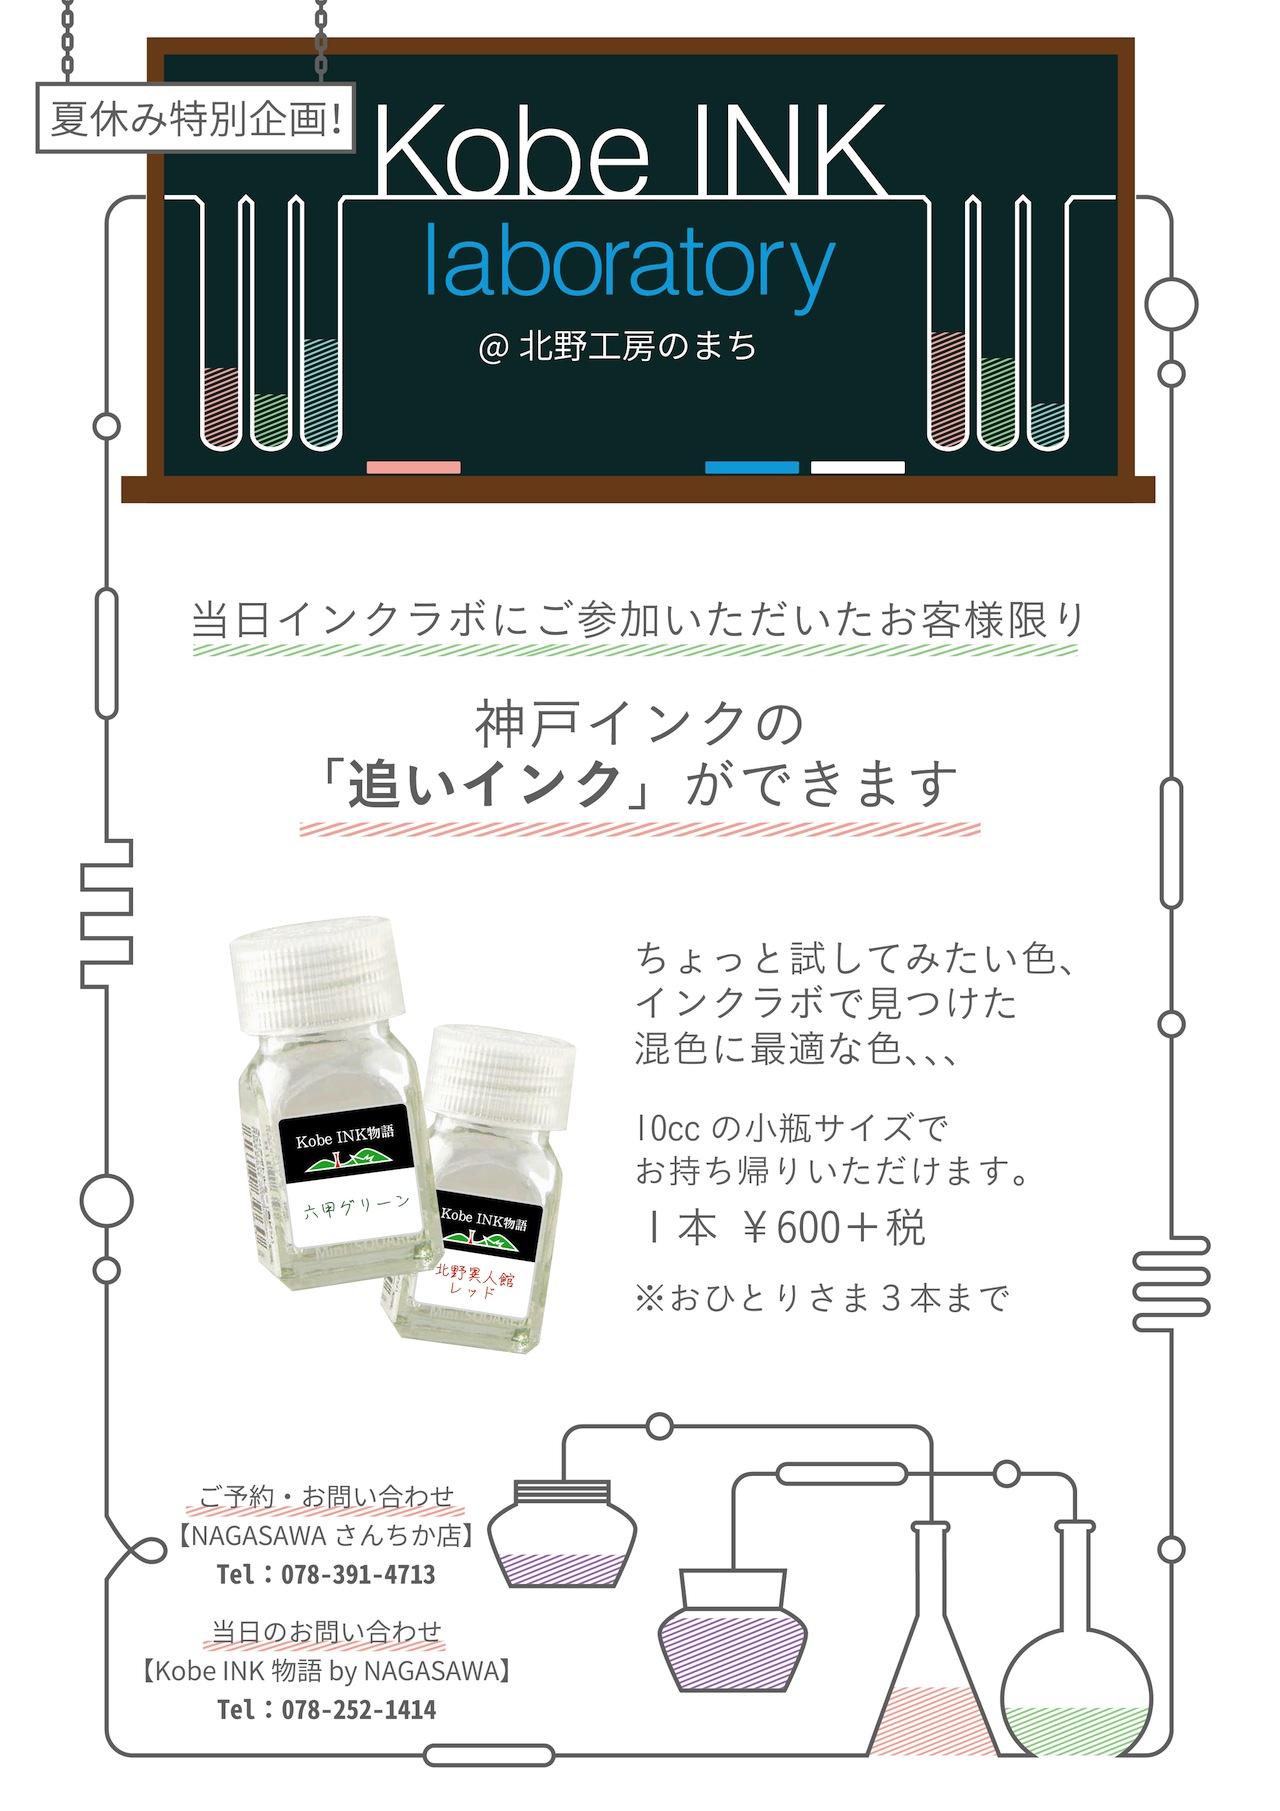 KOBE  INK  laboratory  @北野工房のまち2階 KobeINK物語店の向かい